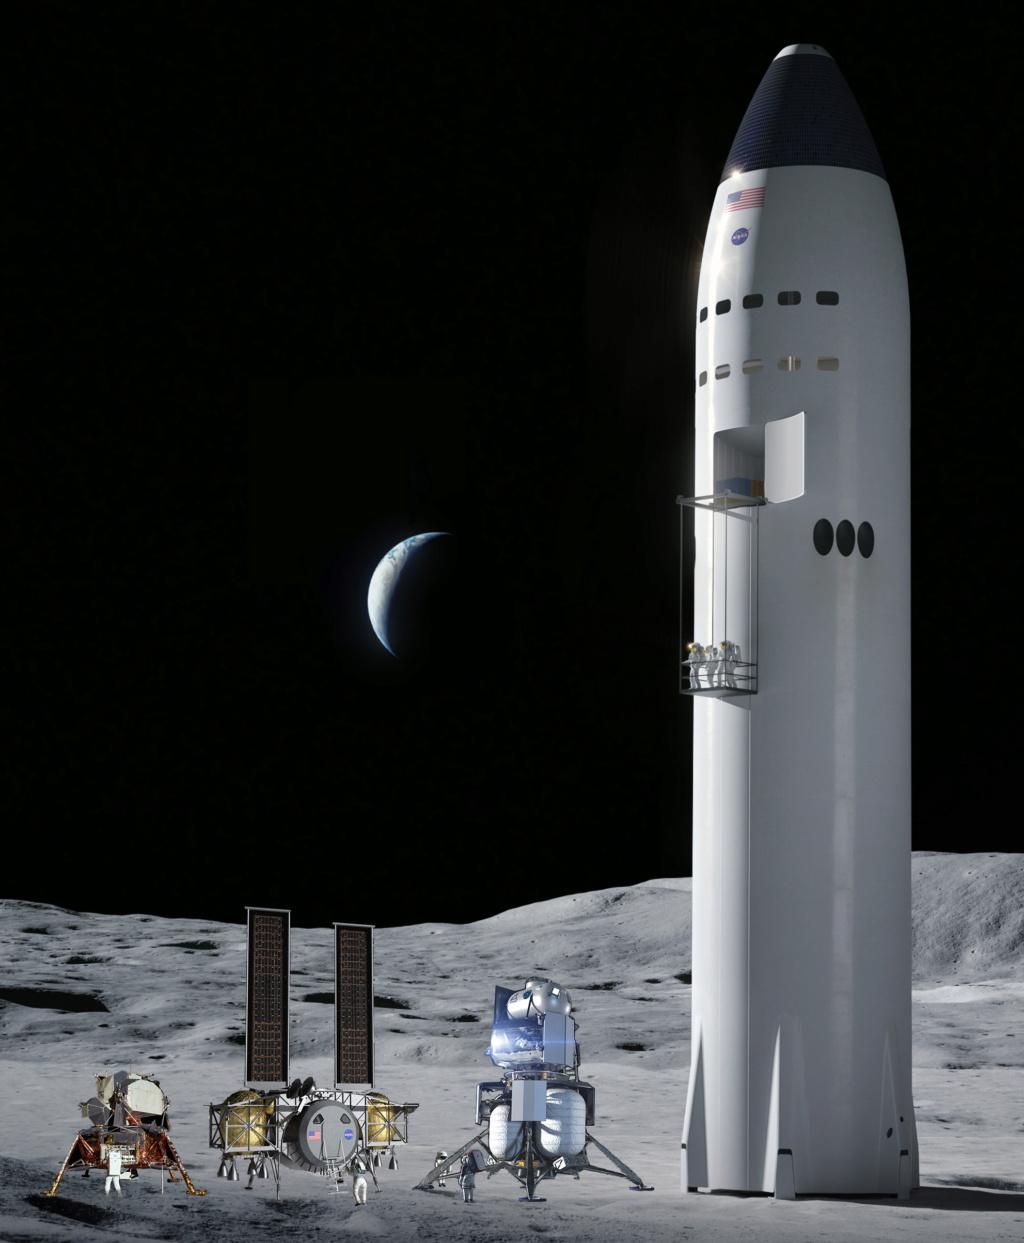 [Artemis] Atterrisseur habité (Crewed Lunar Lander) - Page 10 Artemi12